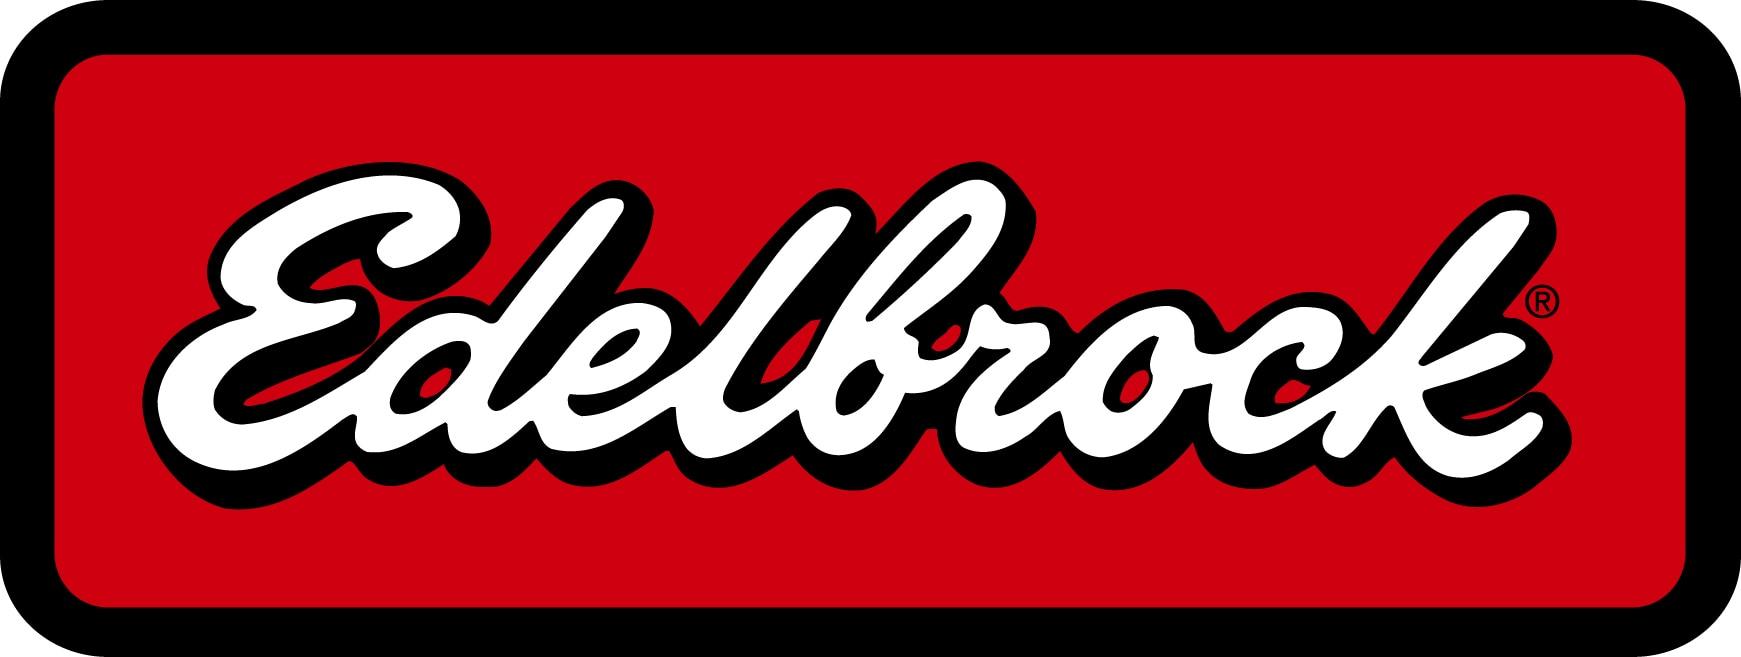 Edelbrock 1460 METERING ROD.065 x .052 Third Brake Lights ...